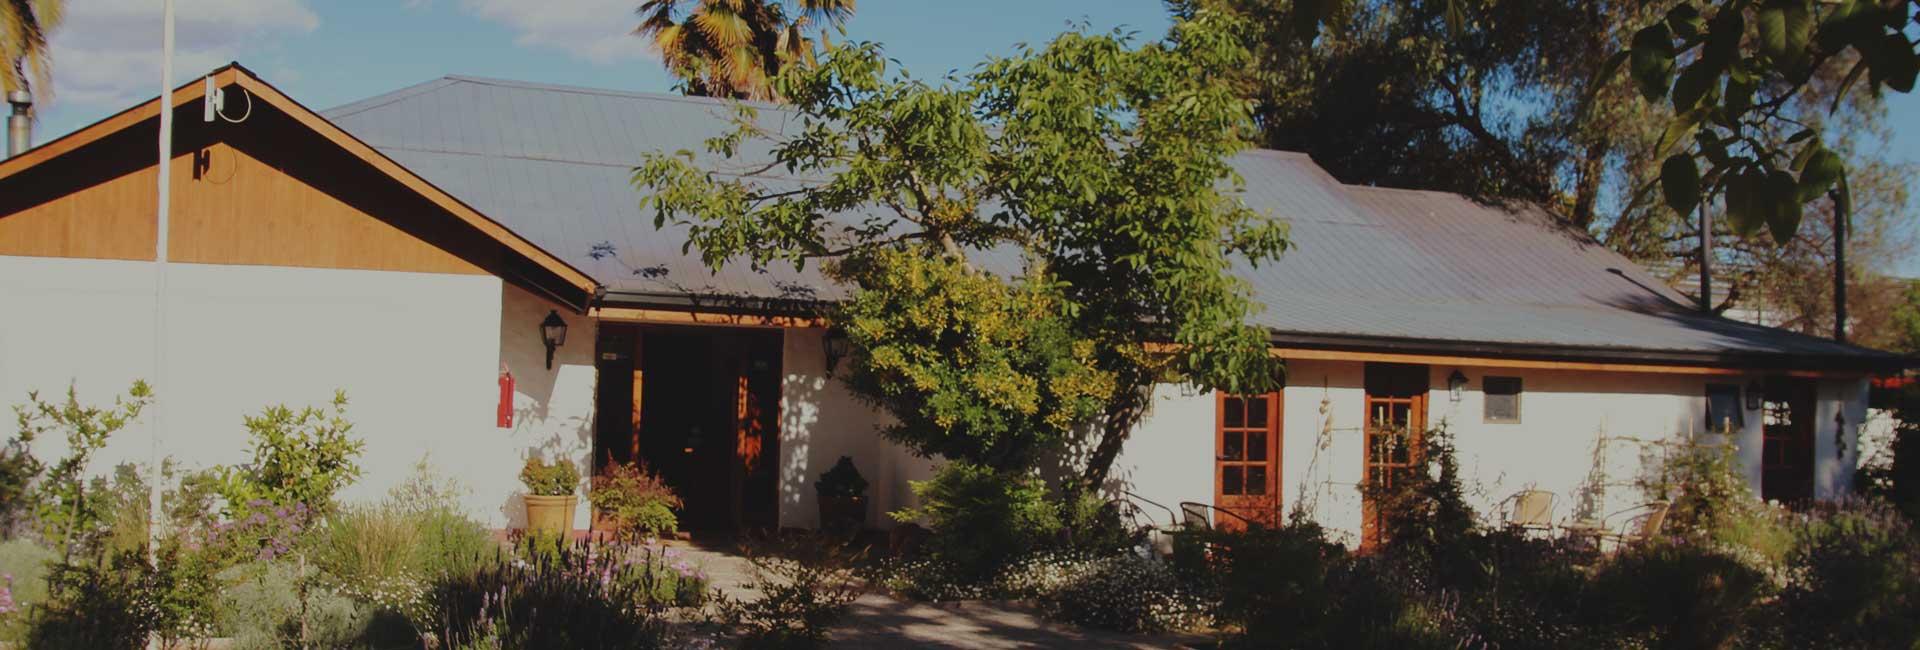 Casa Calfu Header